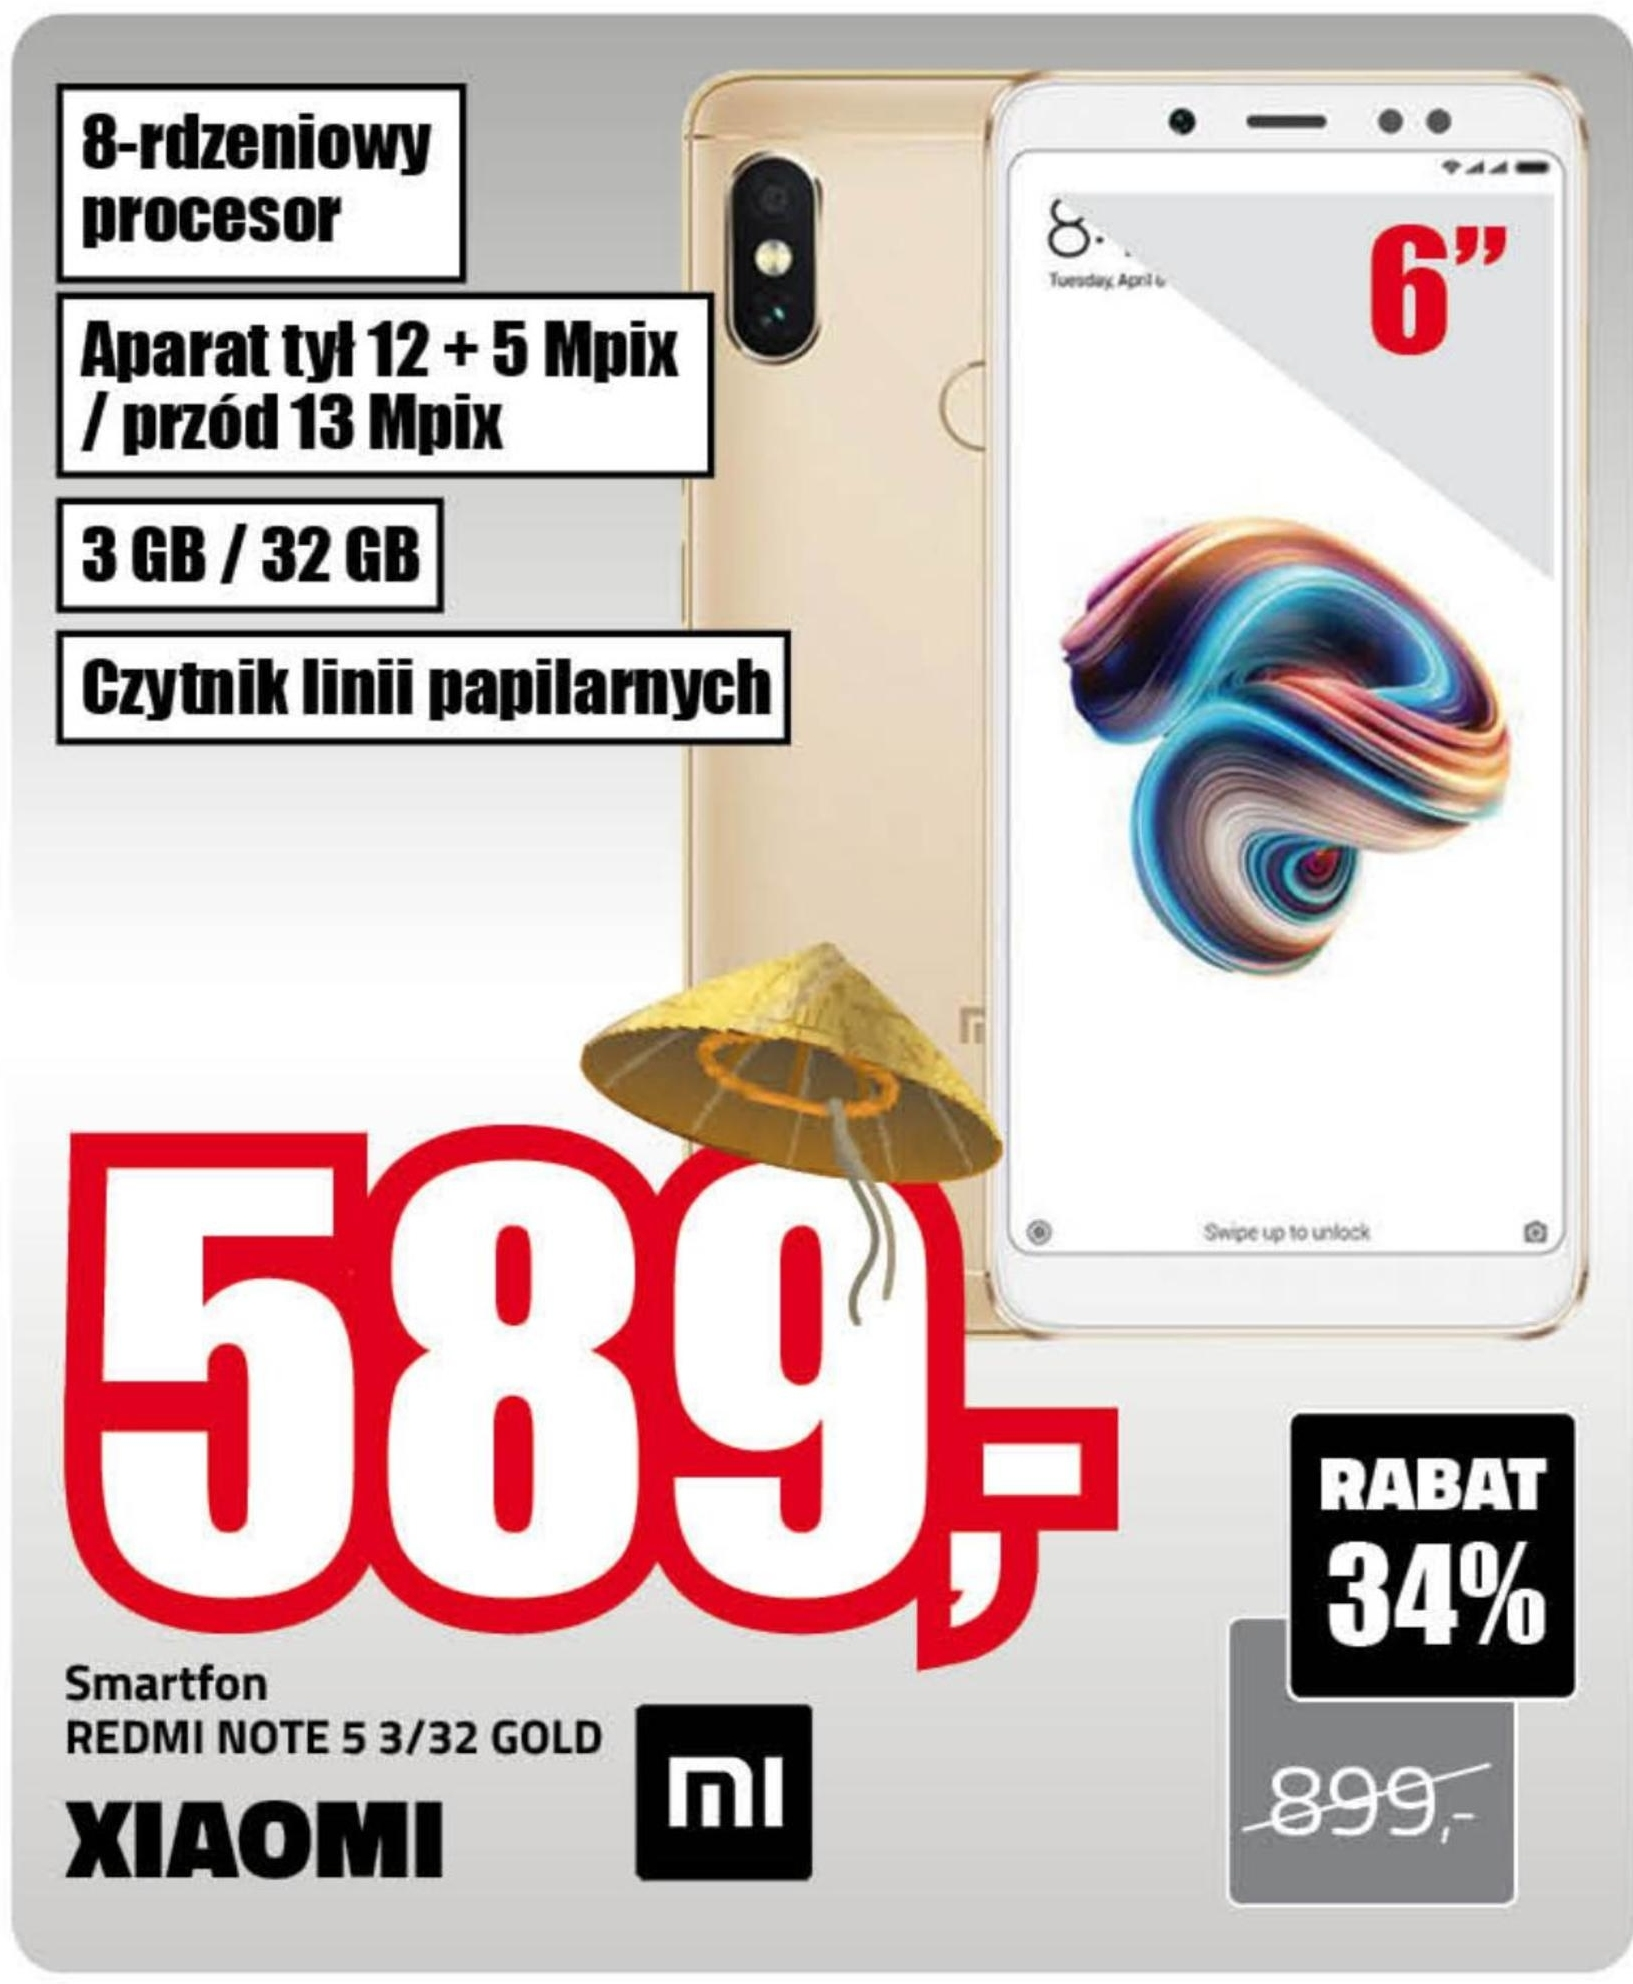 Smartfon Redmi Note 5 Xiaomi niska cena